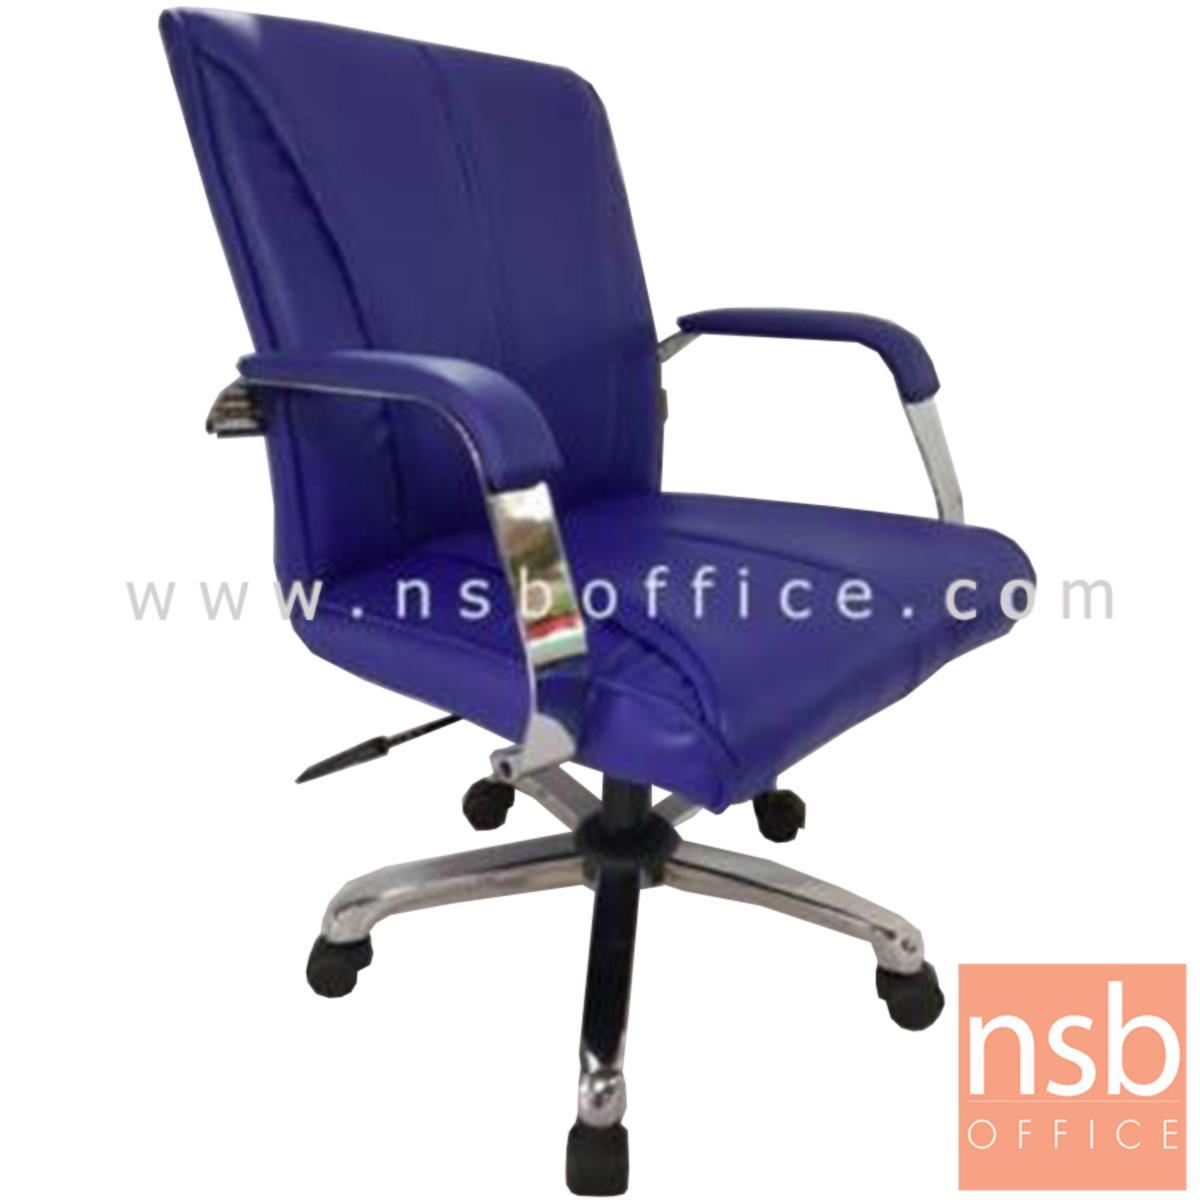 B03A415:เก้าอี้สำนักงาน รุ่น Chelly  โช๊คแก๊ส ขาเหล็กชุบโครเมี่ยม